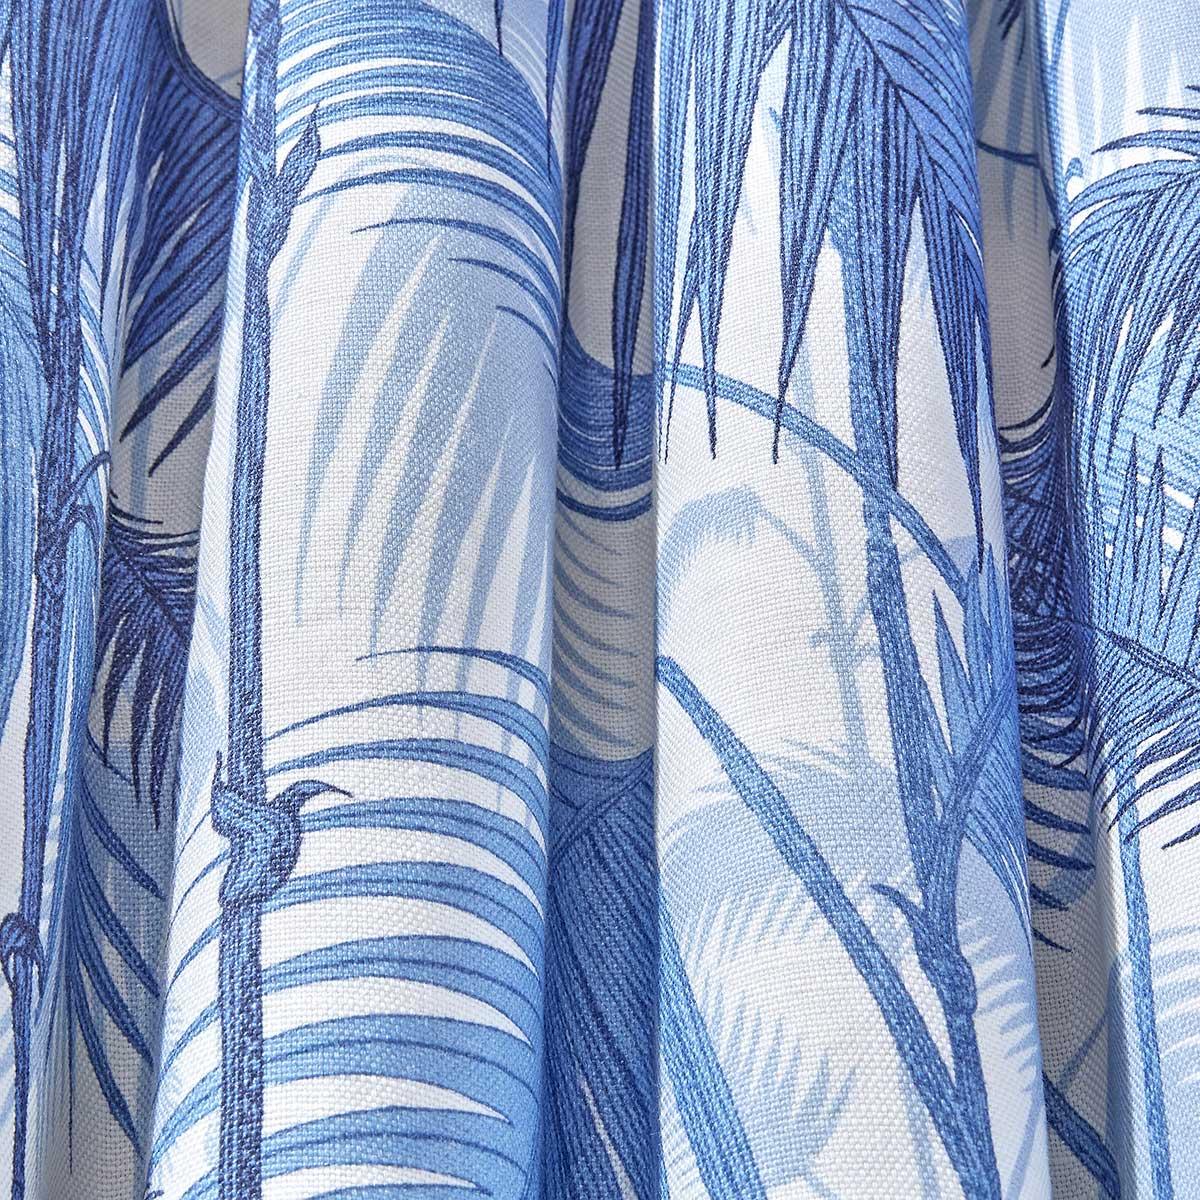 Cole & Son Palm Jungle China Blue / Snow Fabric - Product code: F111/2006LU